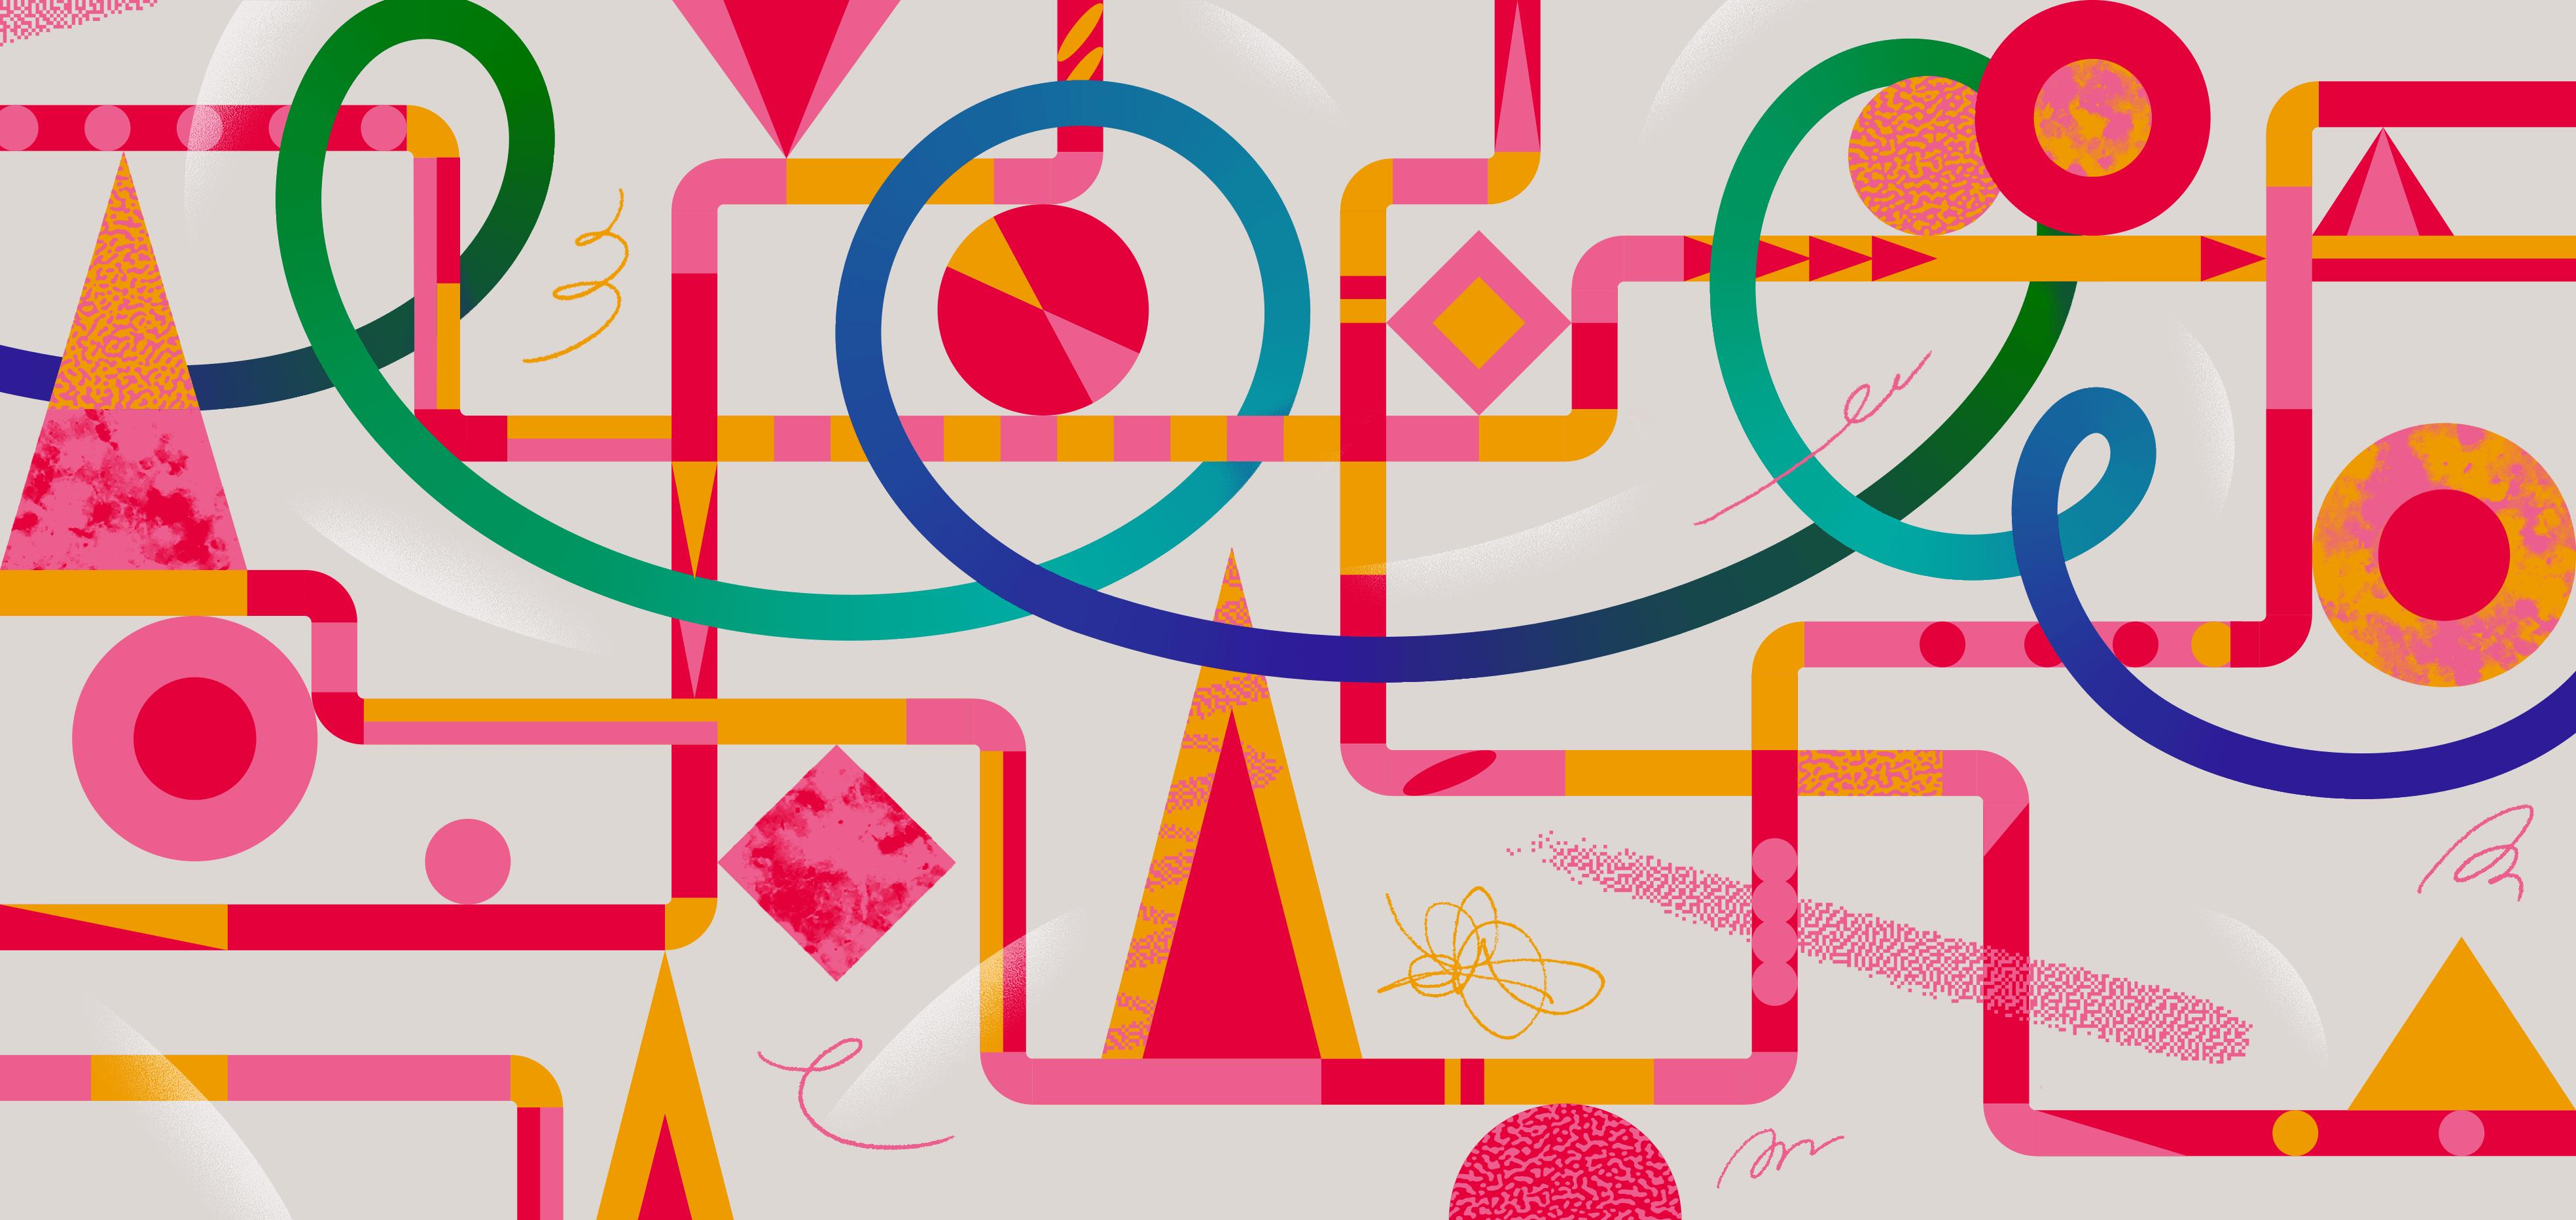 Design leadership as a subversive activity - Inside Intercom